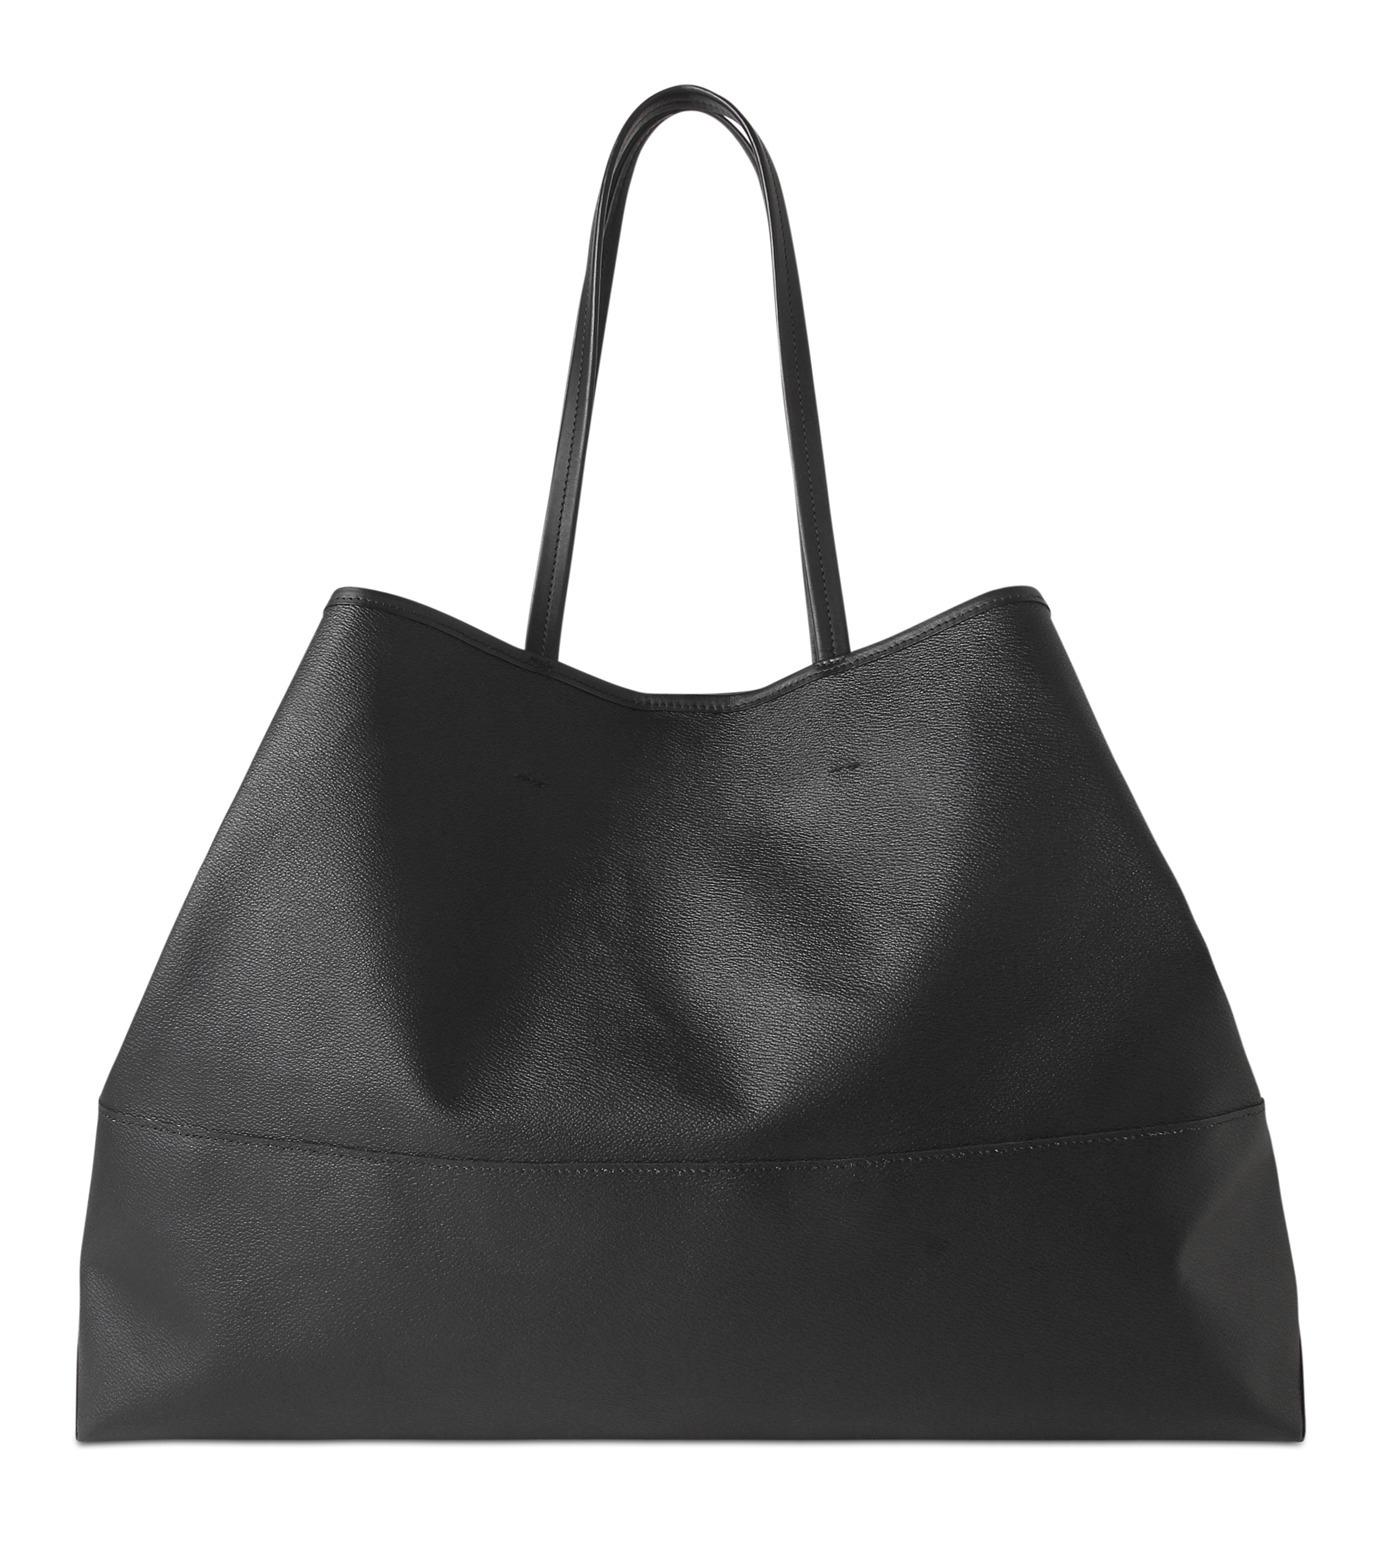 HL HEDDIE LOVU(エイチエル・エディールーヴ)のBIG TOTE BAG-BLACK(バッグ/bag)-17A90004-13 拡大詳細画像3